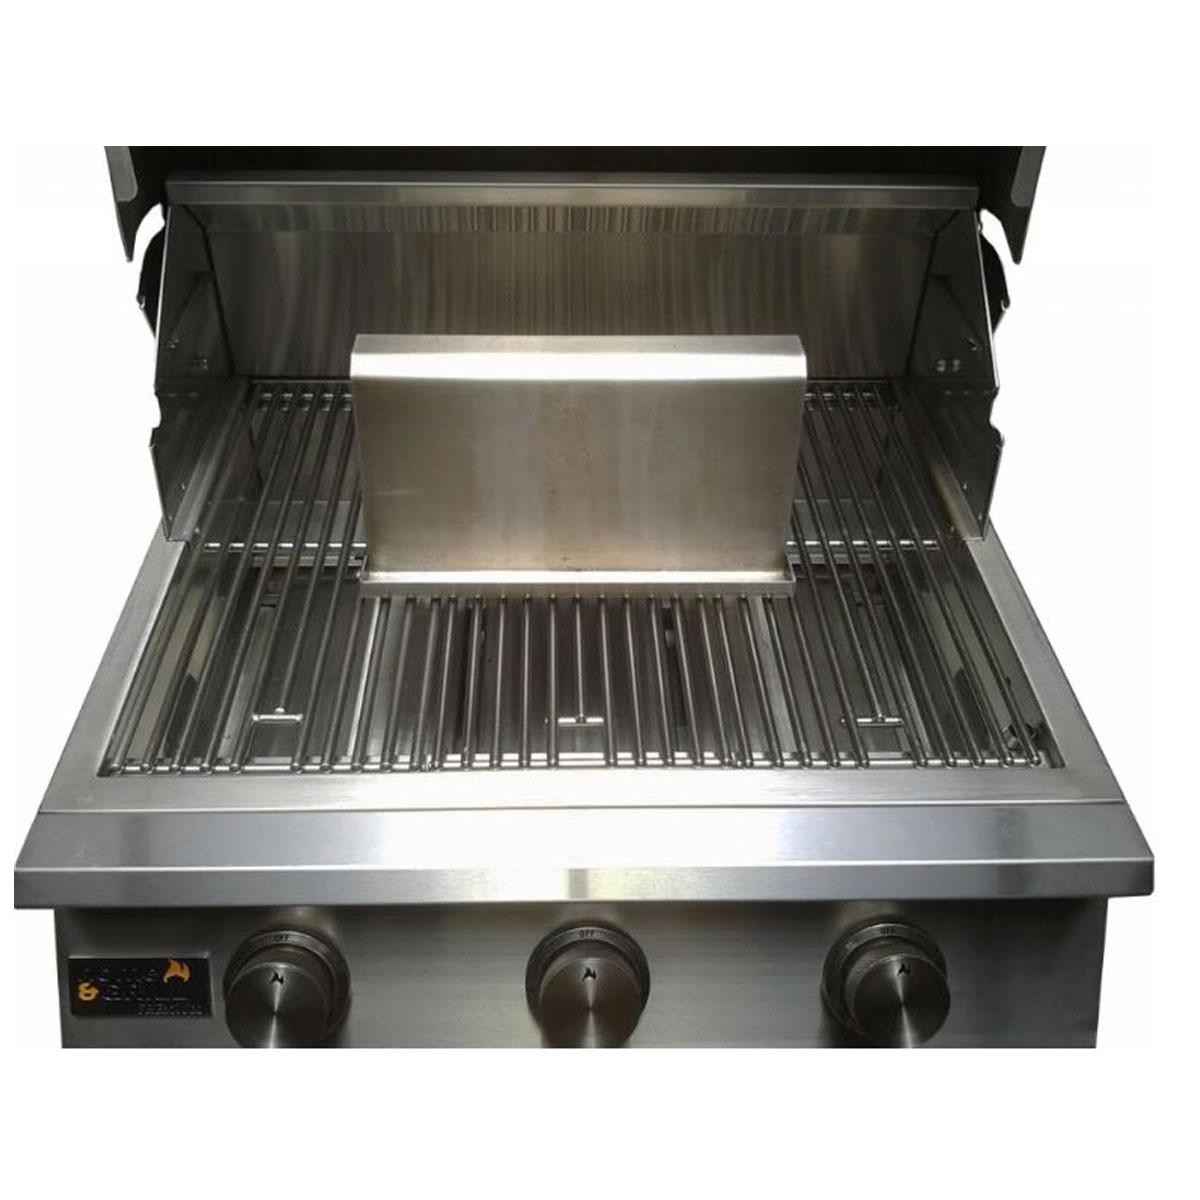 Kit Chapa Bacon Grilling Crispy Inox 304 + Escova Tramontina  - Sua Casa Gourmet e Cia